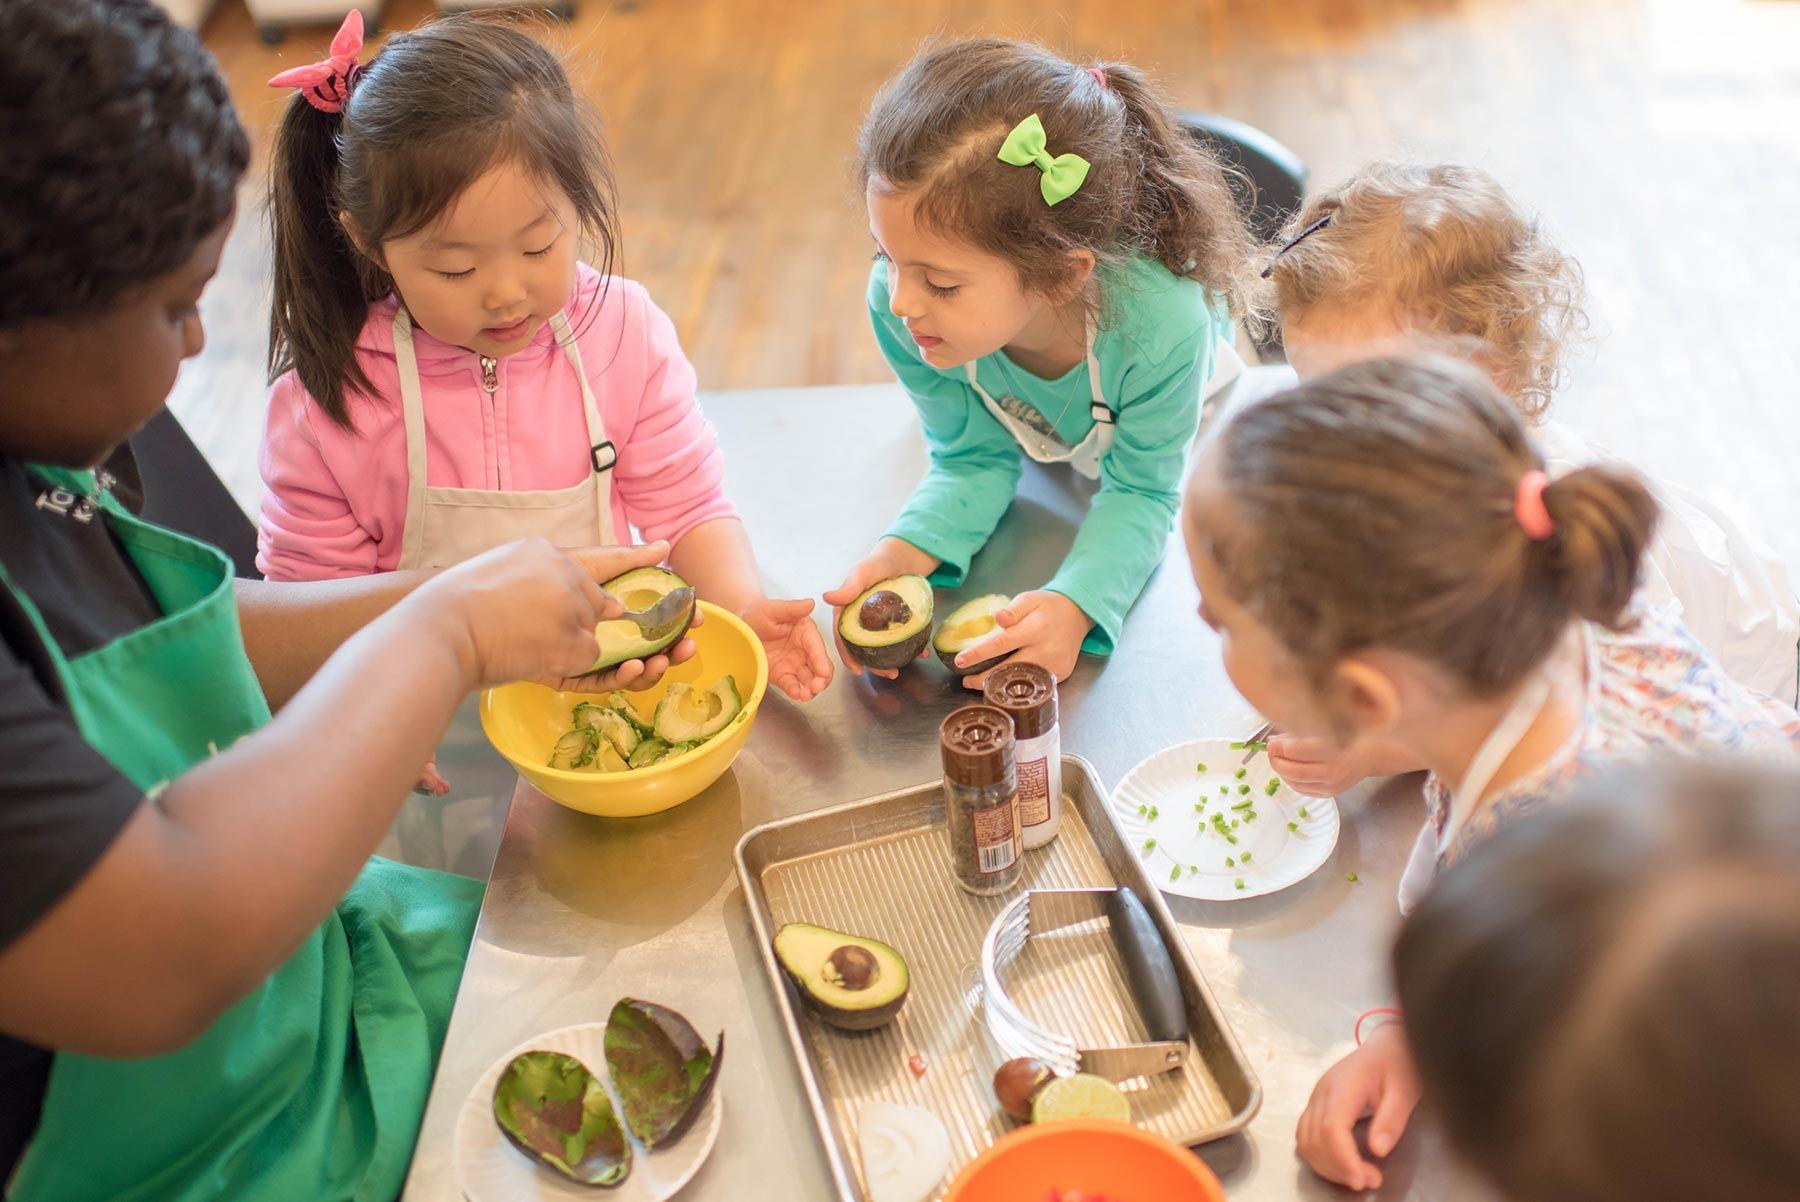 East Greenwich Ri Taste Buds Kitchen Cancer Kids Cookies For